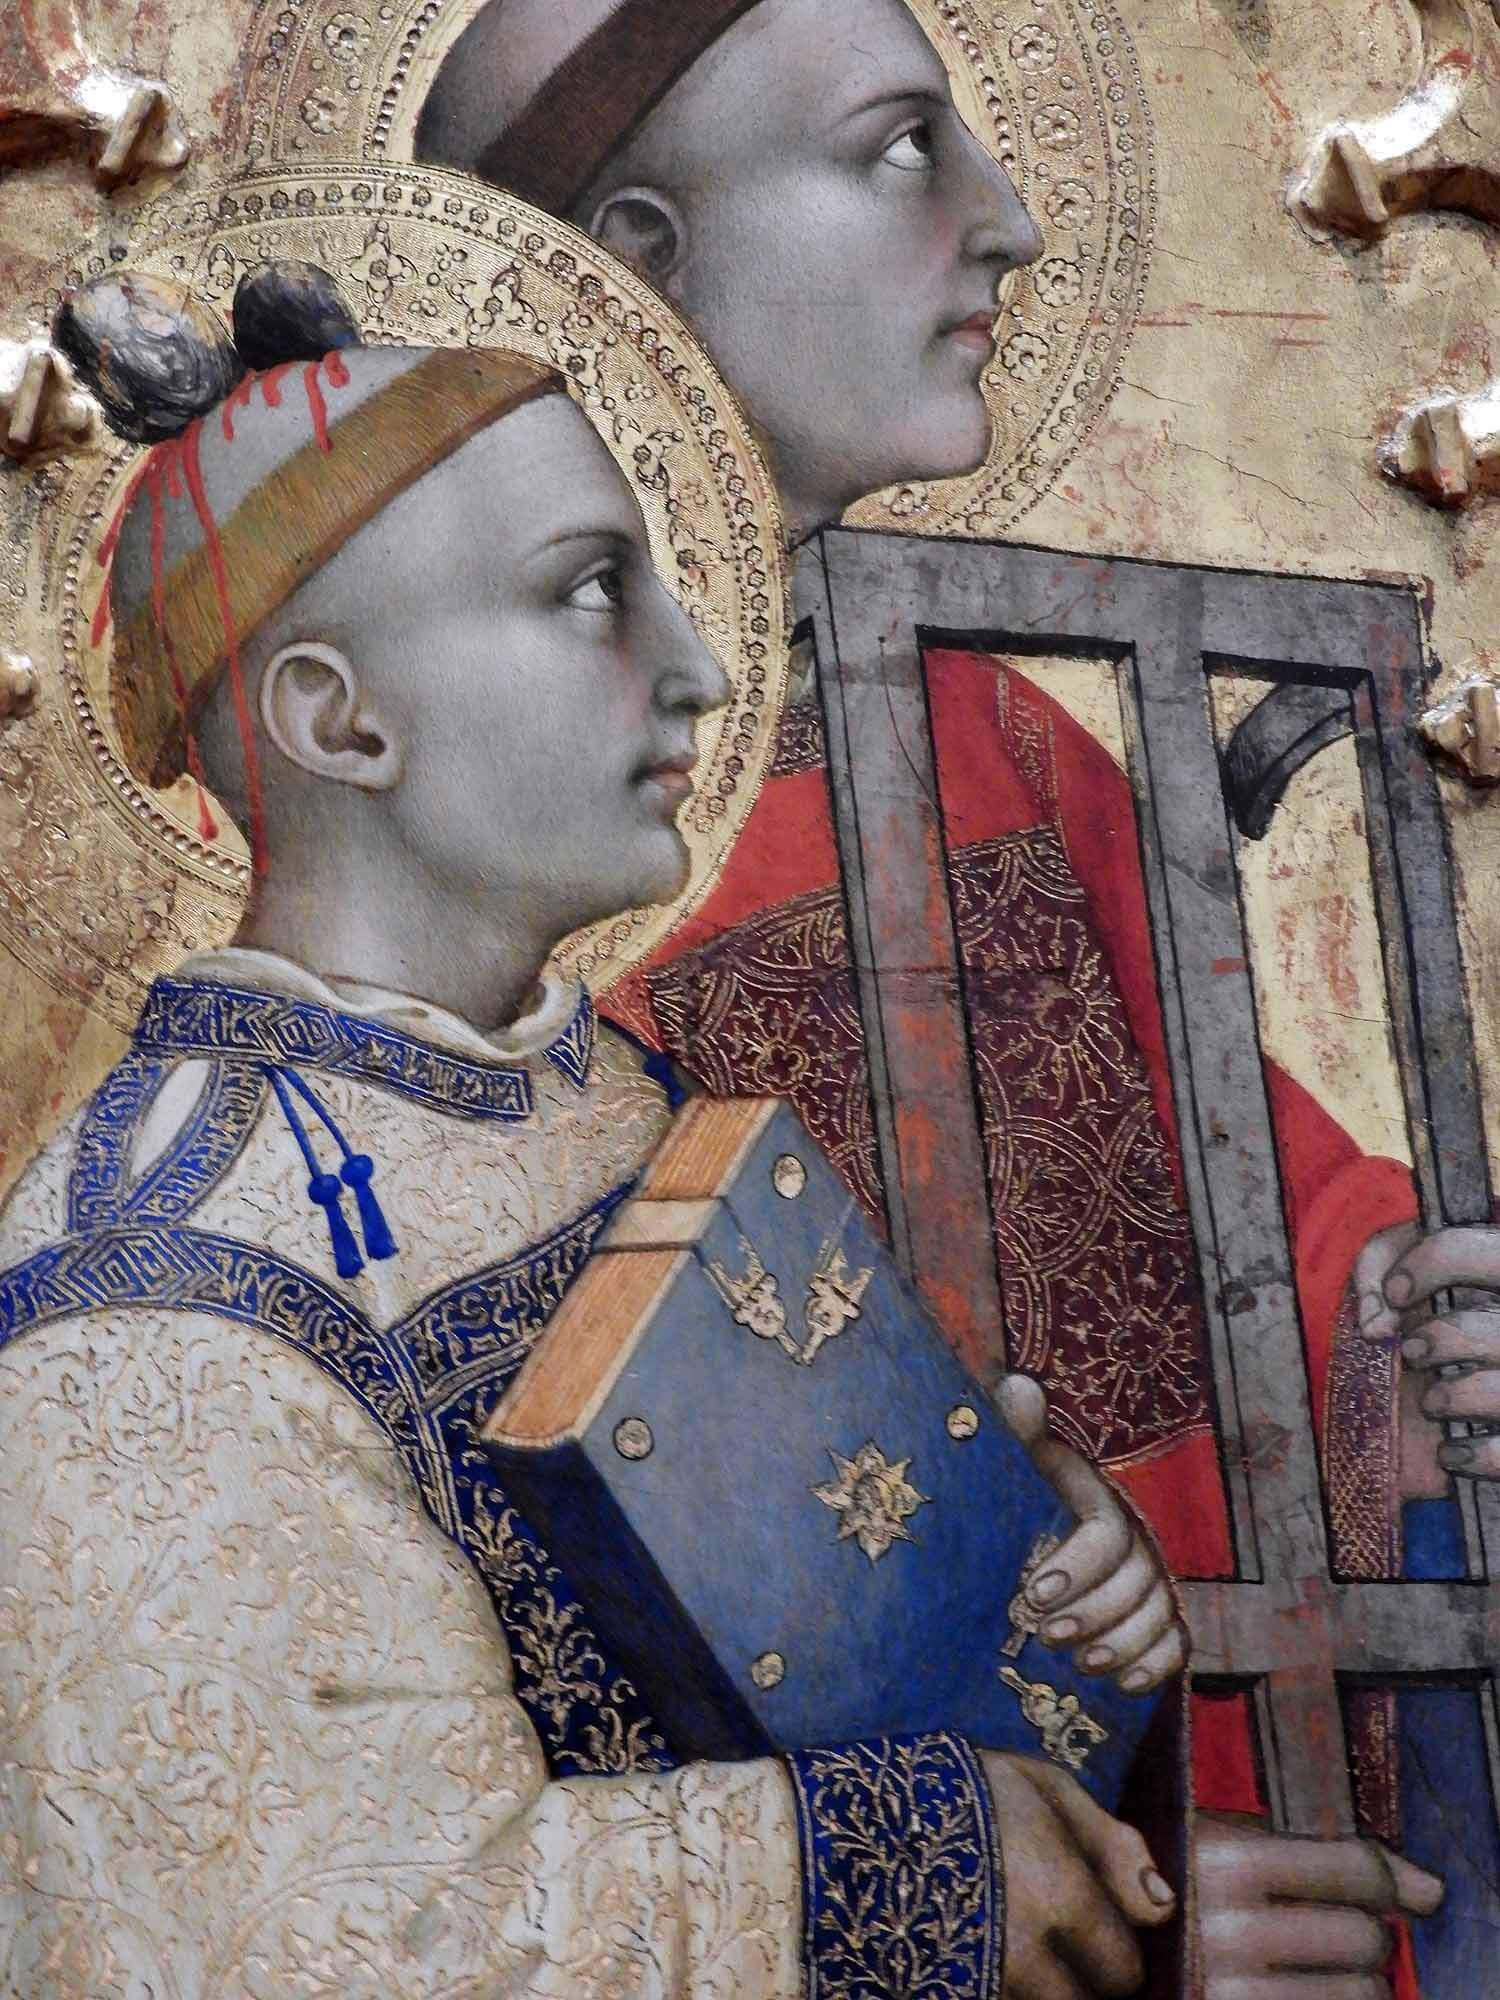 italy-italia-florence-uffizi-museum-icon-saints-martyr.JPG